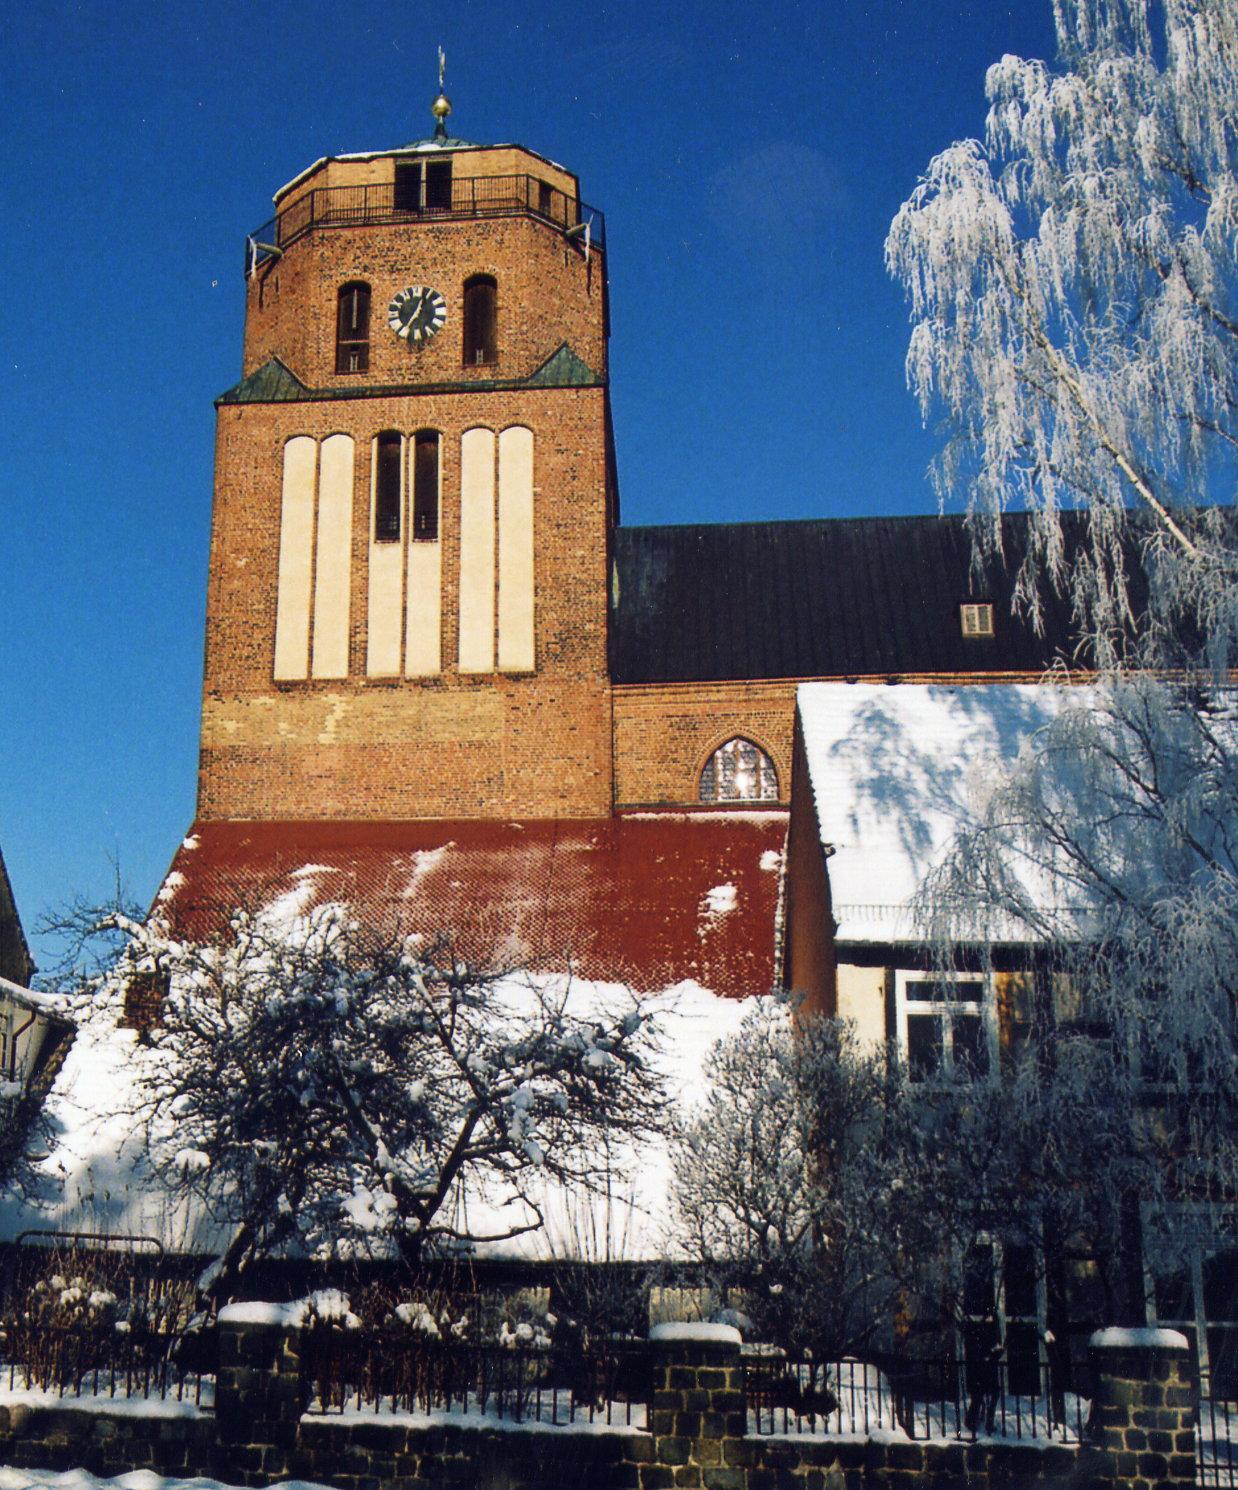 Turm der großen Backsteinbasilika St. Petri, Wolgast, Foto: privat